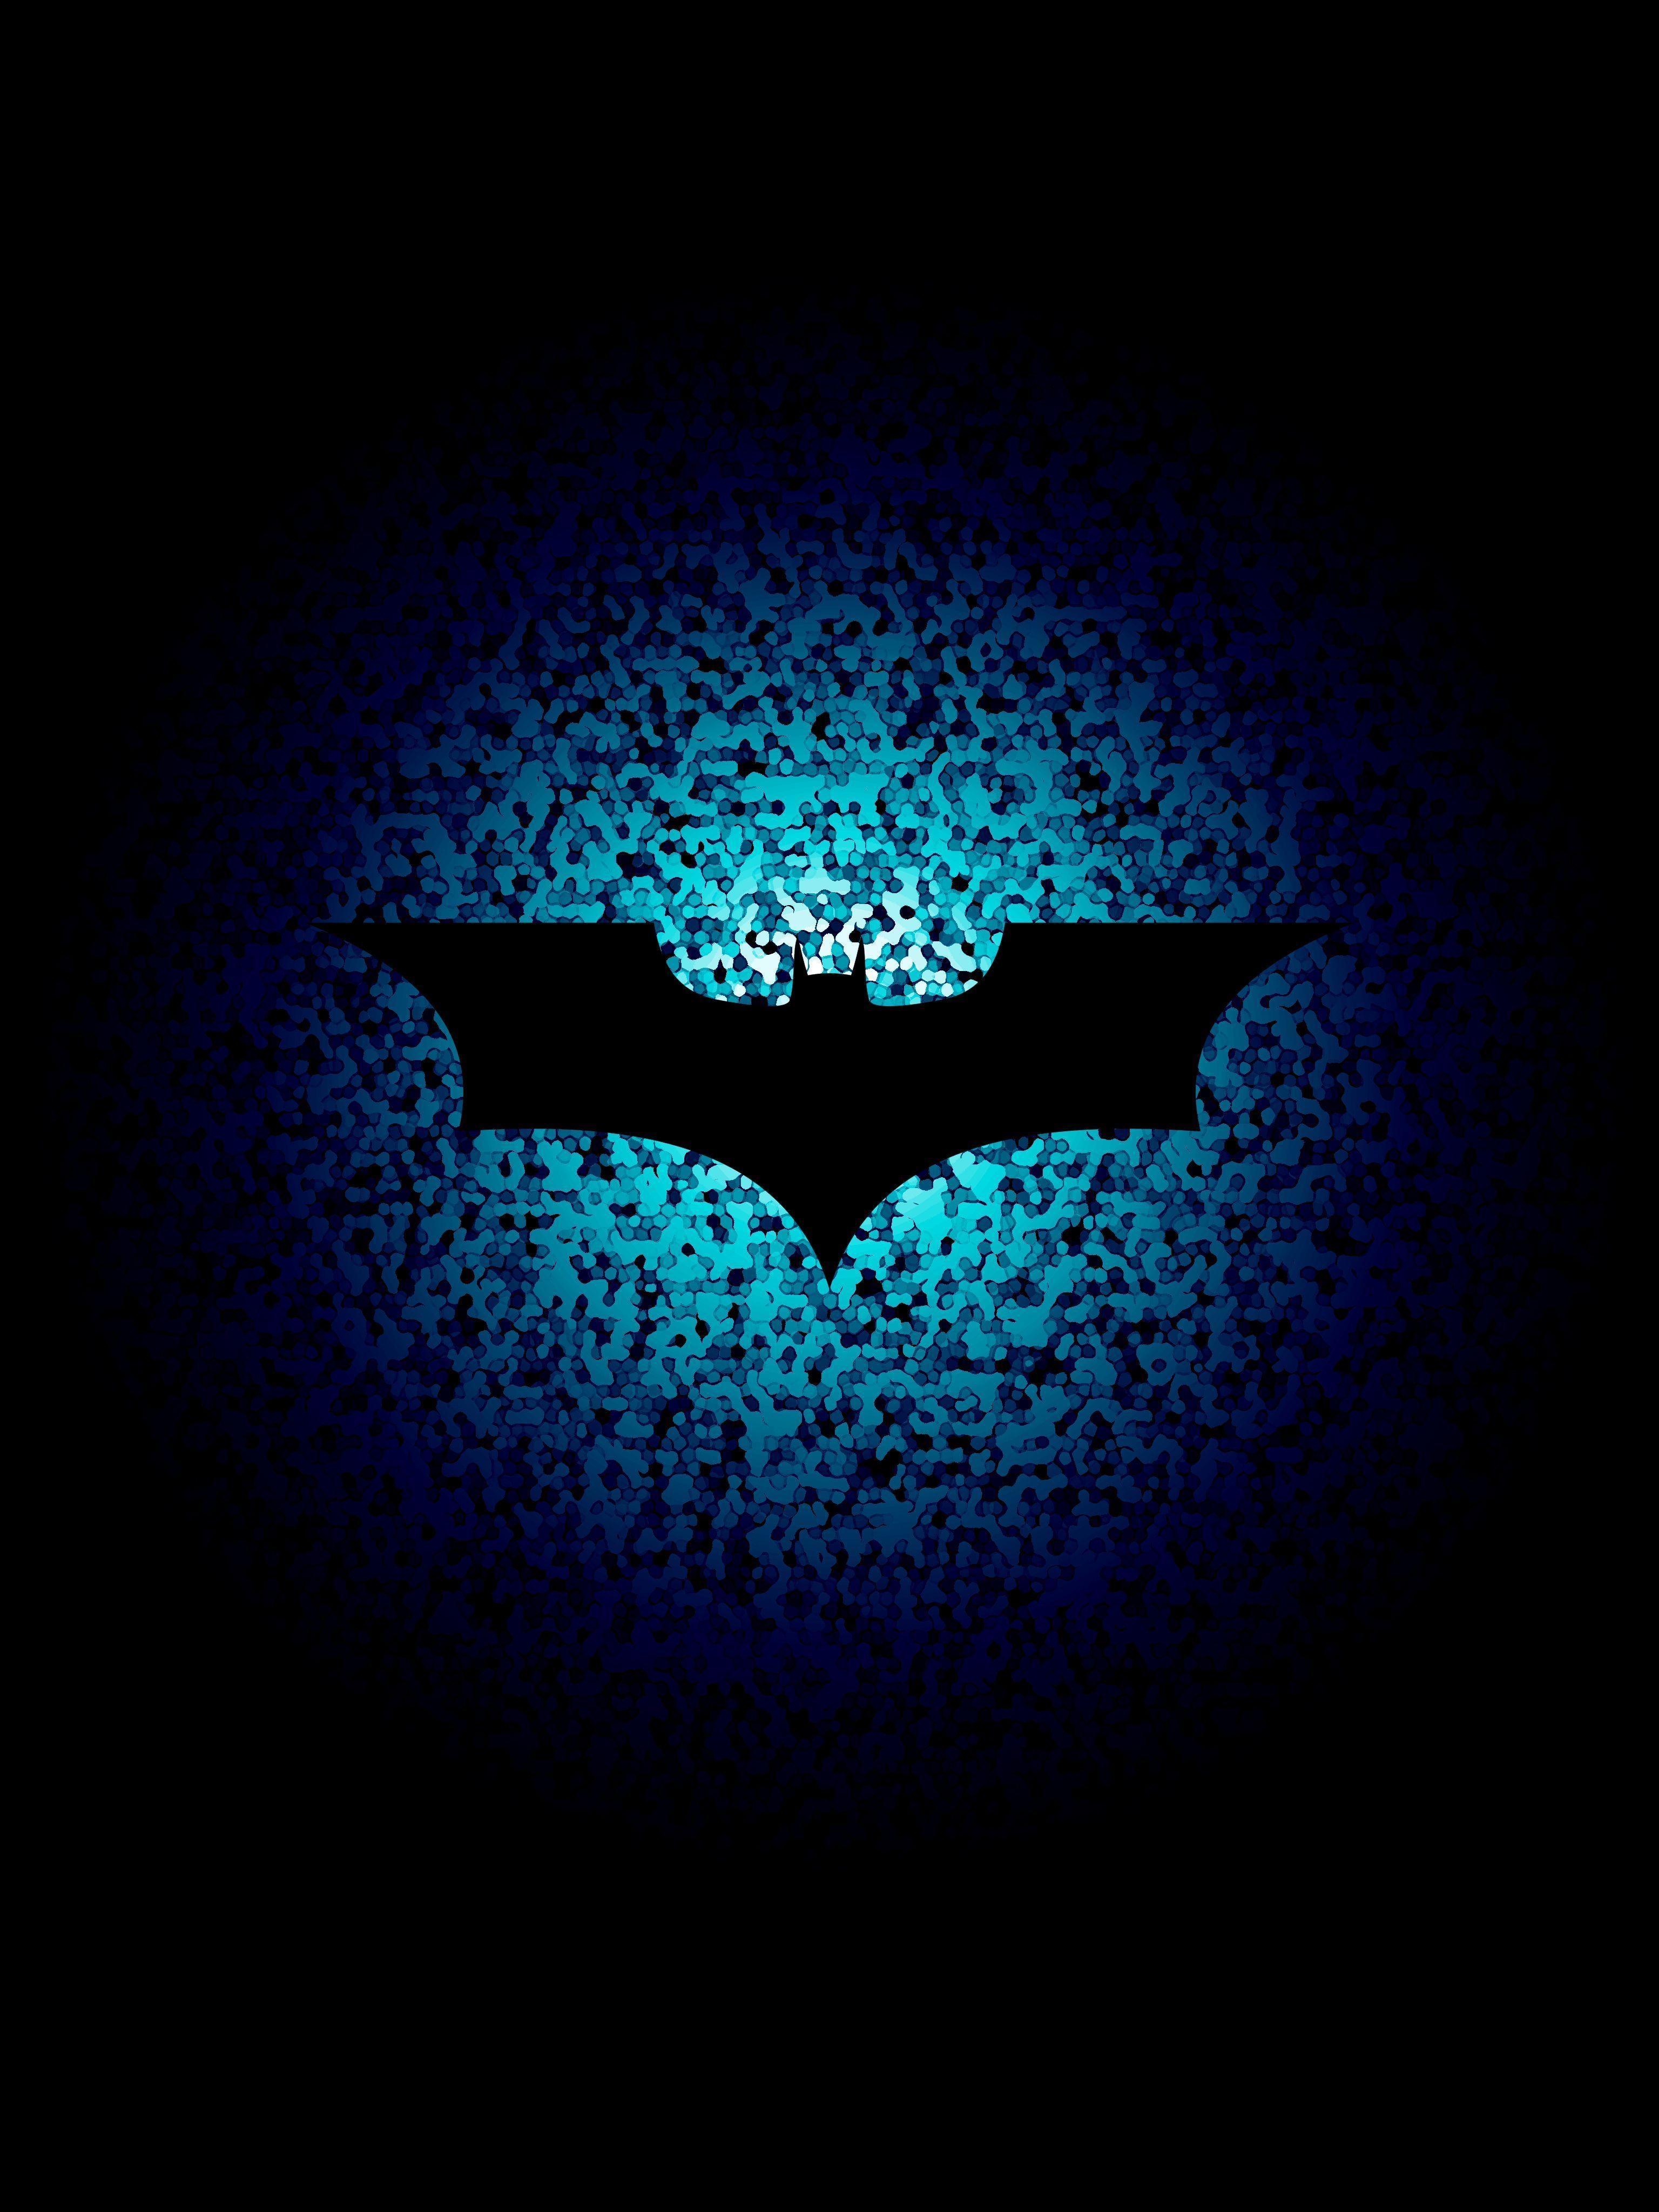 Joker Wallpaper Backgrounds Iphone Dark Knight